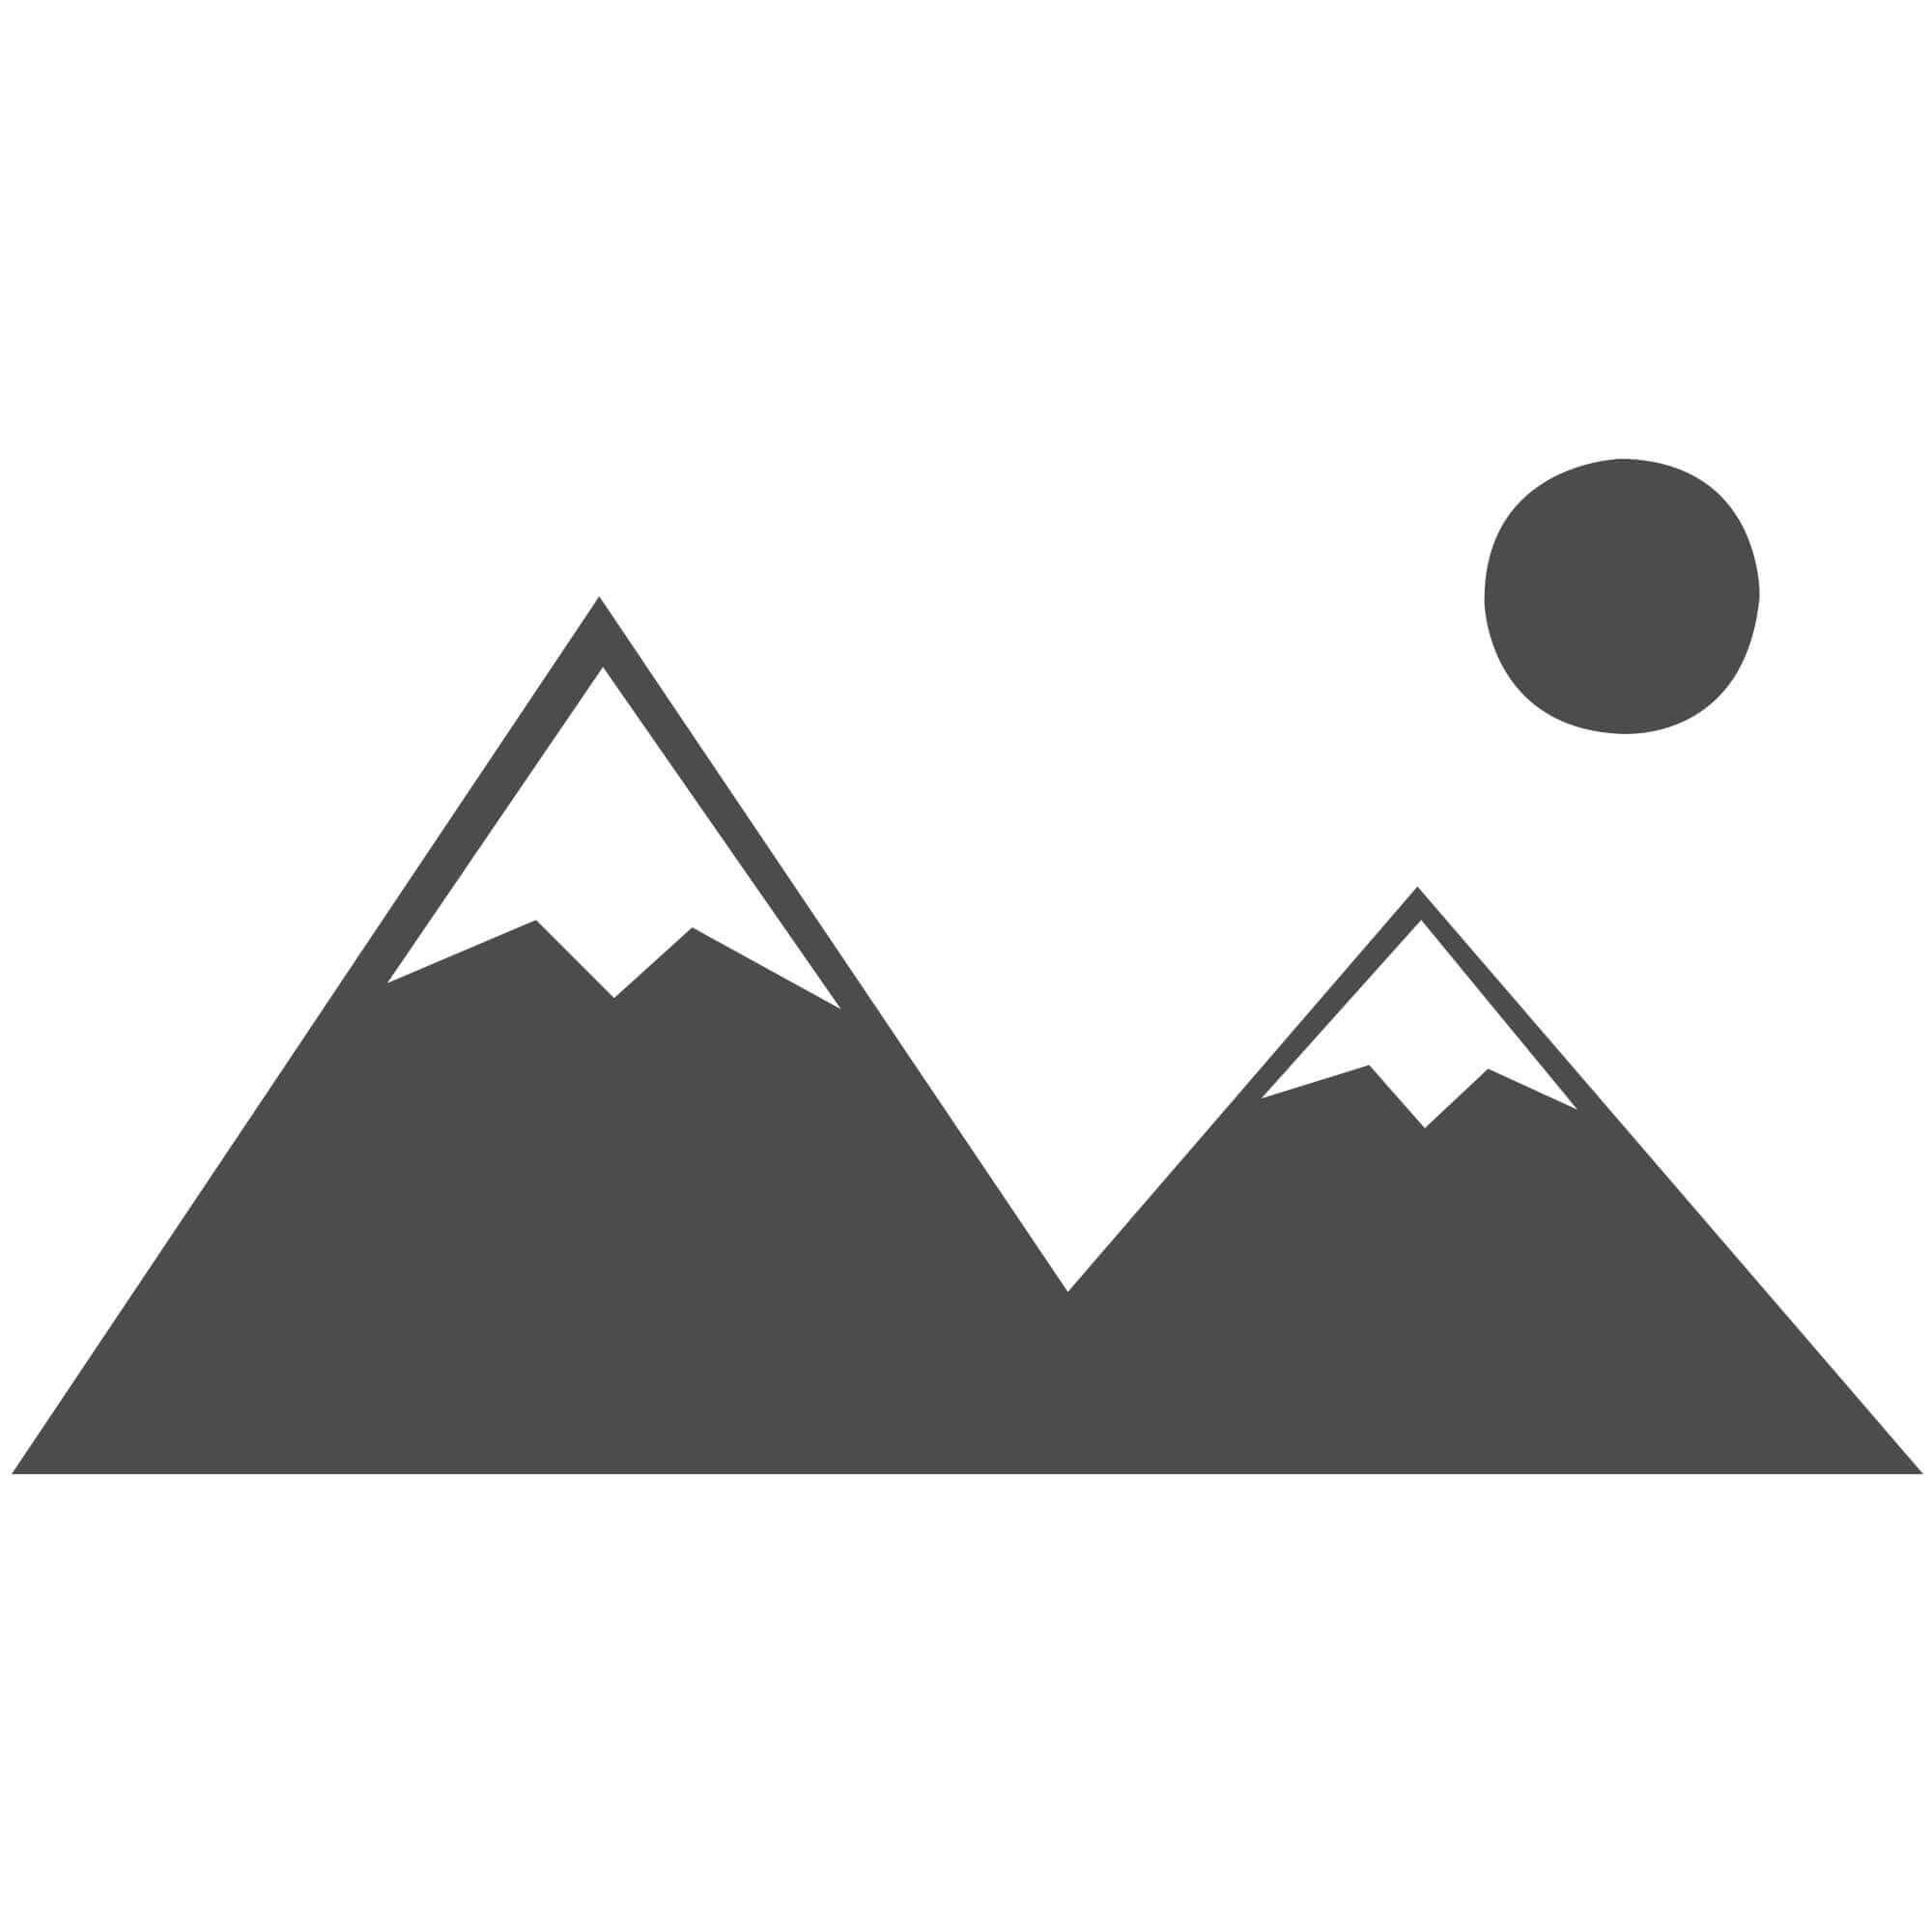 "Velvet Shaggy Rug - Natural - Size 160 x 230 cm (5'3"" x 7'7"")"